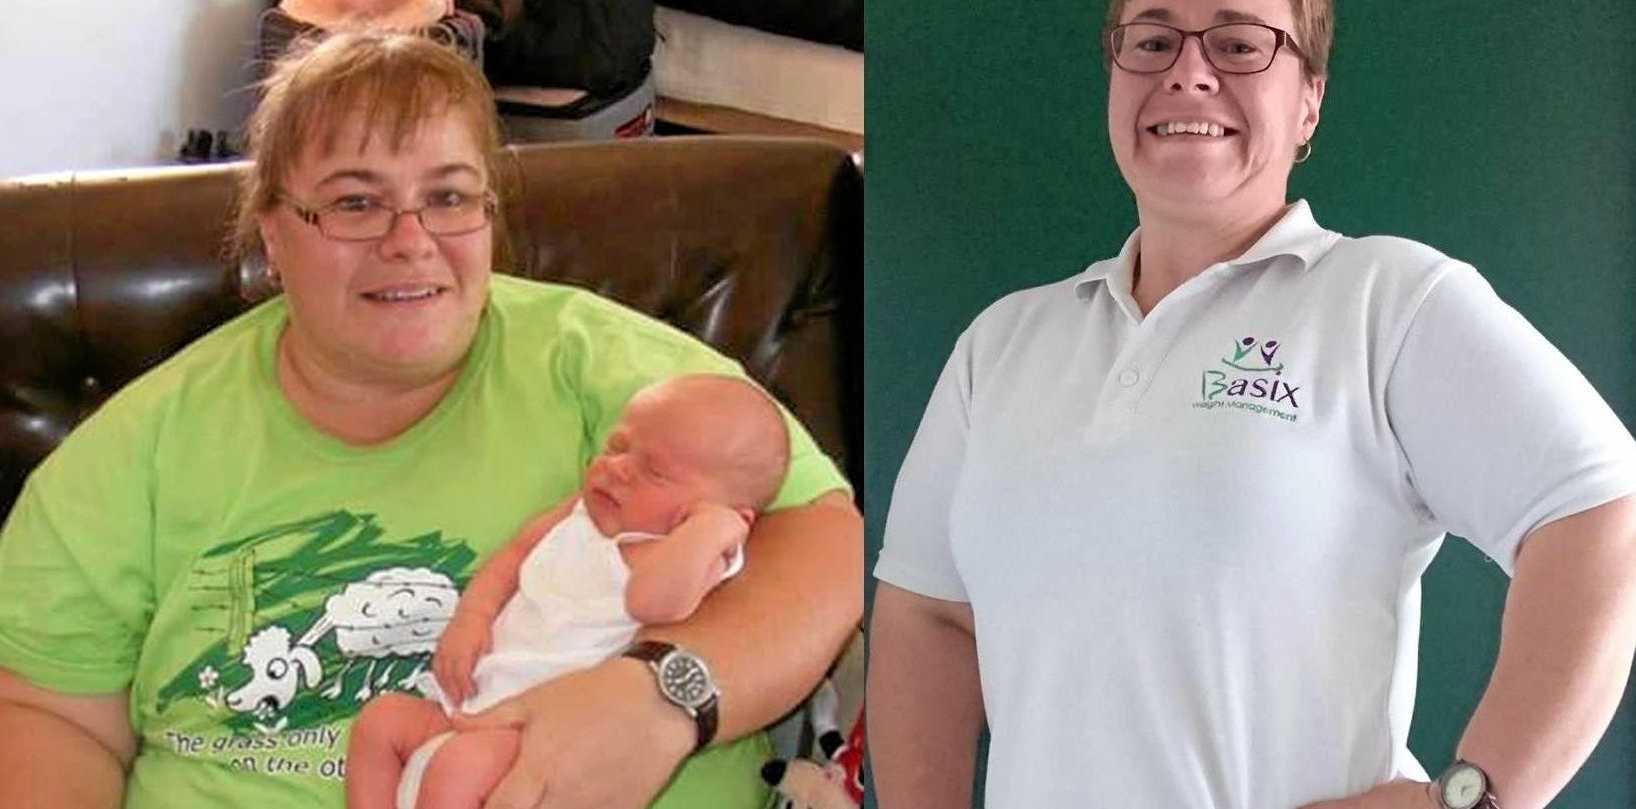 LEFT: Wendy Boshammer three years ago at her heaviest - 148kg. RIGHT: Ms Boshammer today, weighing 85kg.